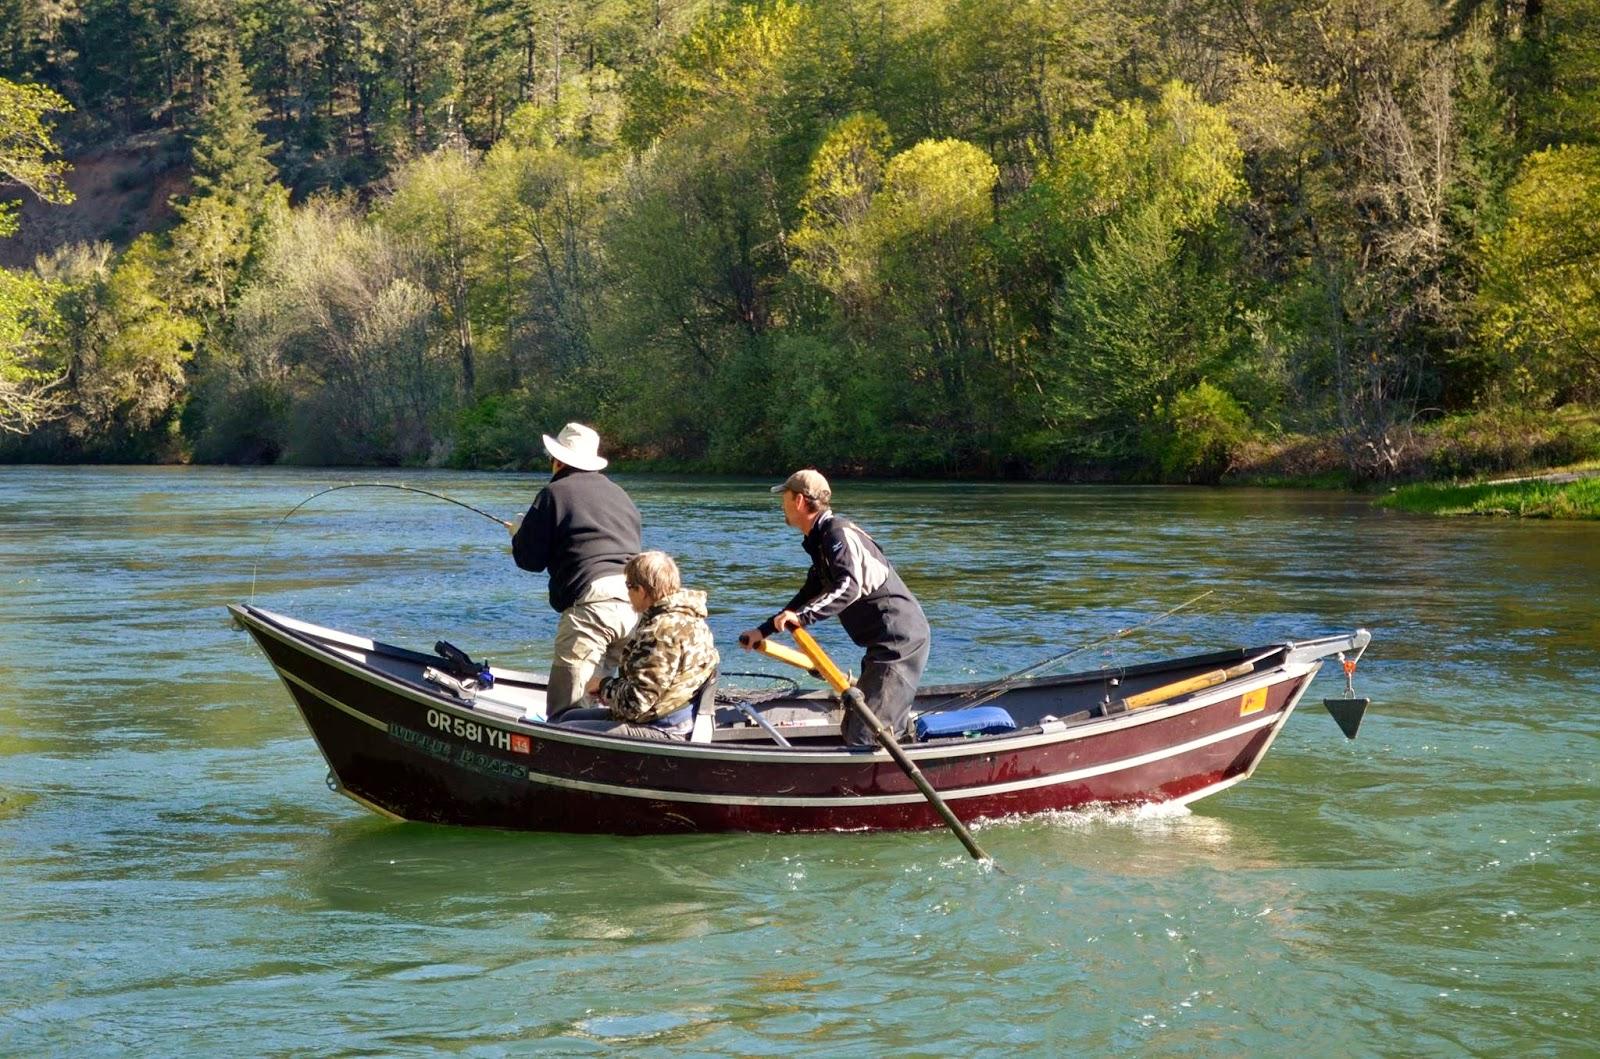 Rogue river salmon steelhead fishing guides rogue river for Rogue river fishing guides